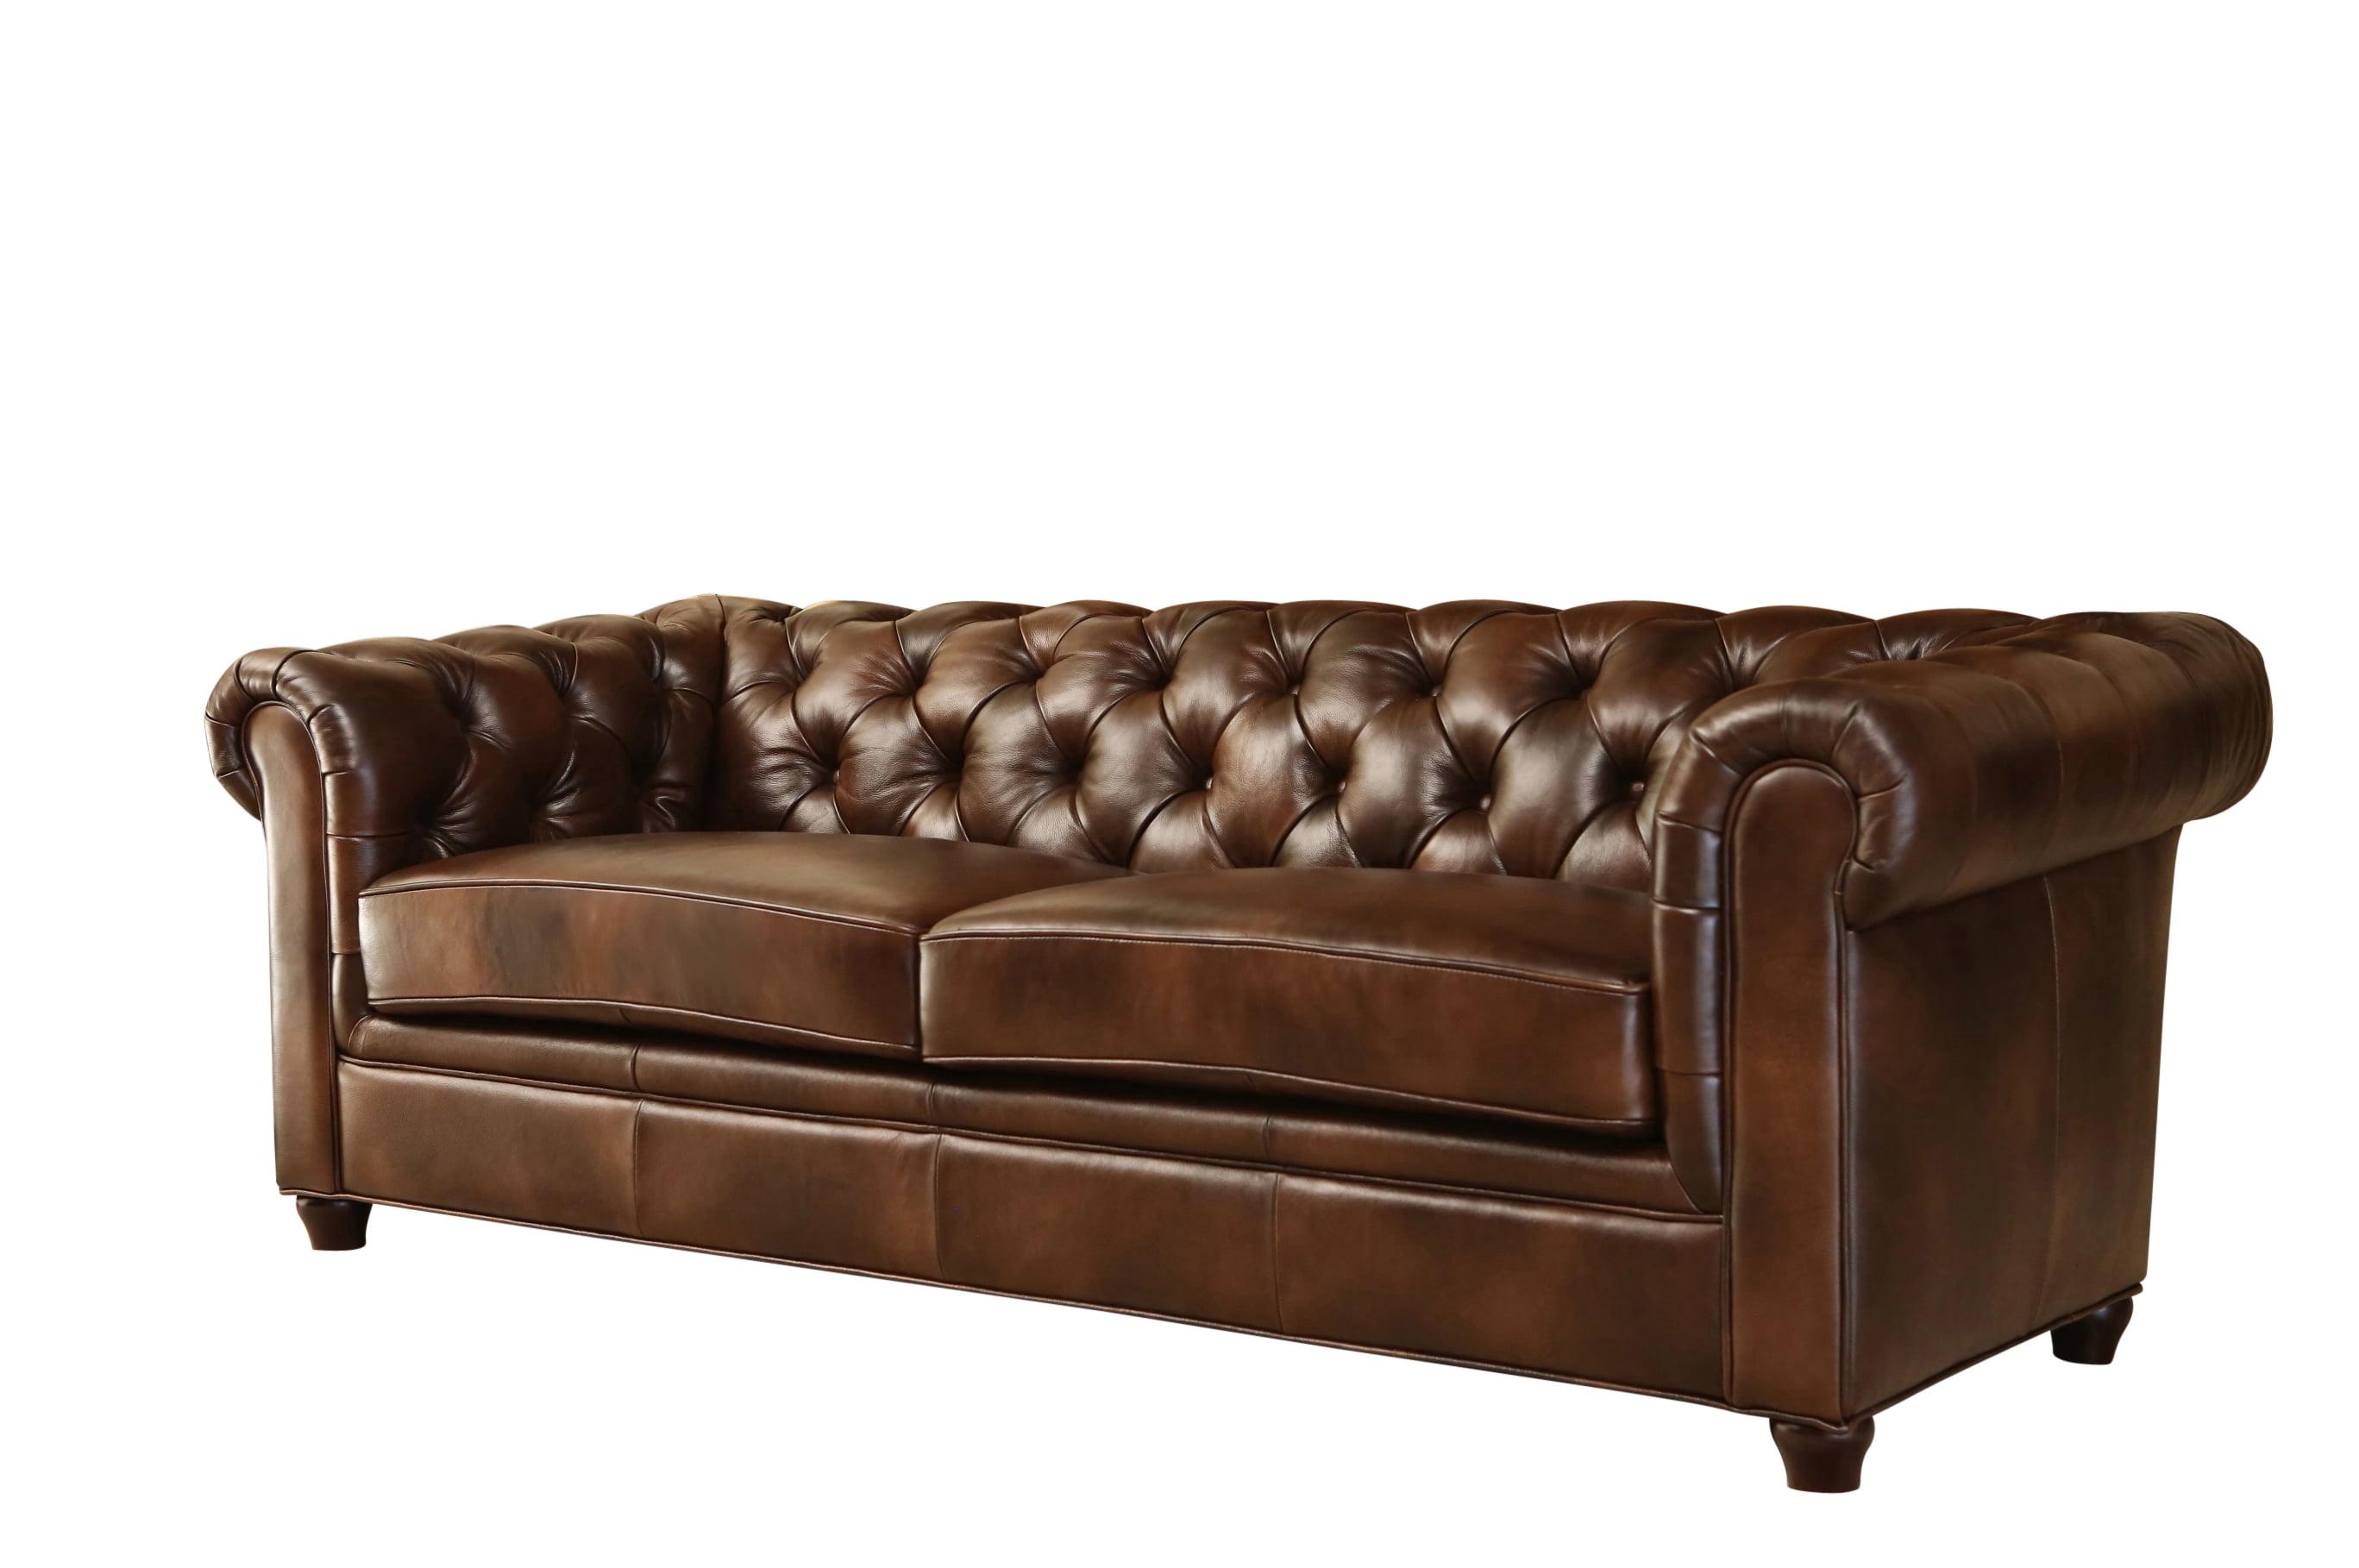 Devon & Claire Monet Tufted Premium Italian Leather Sofa, Brown